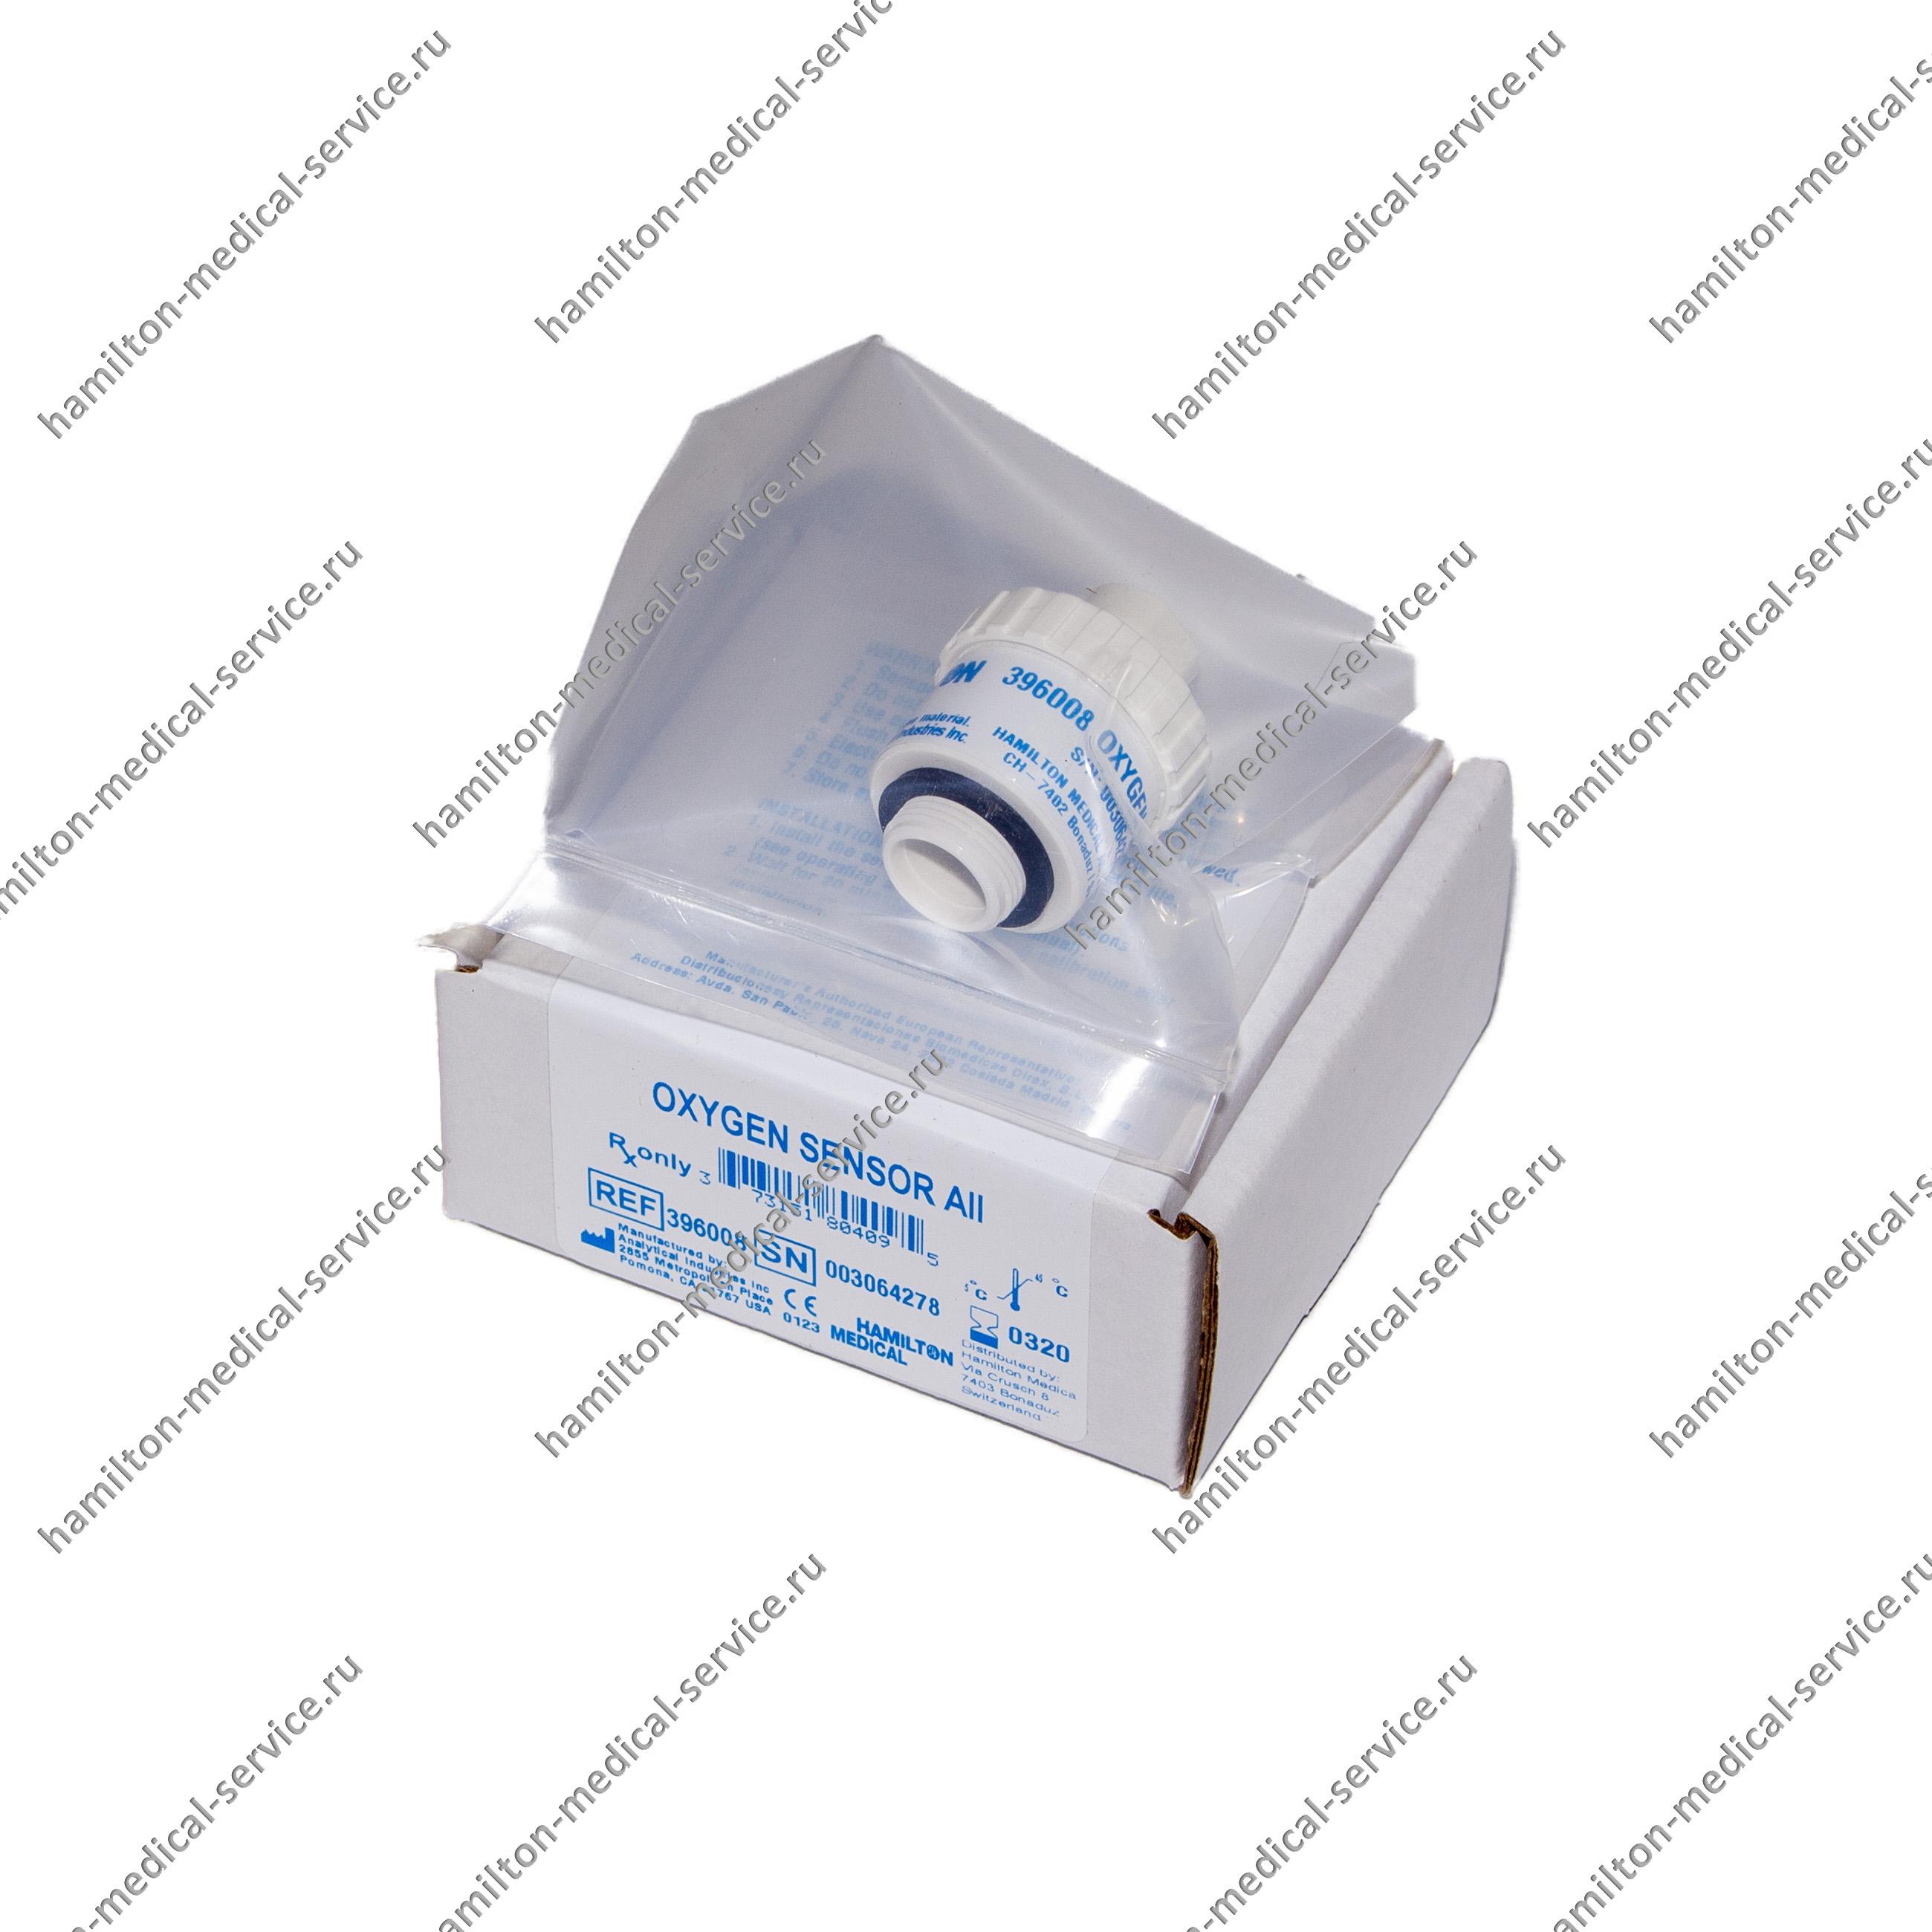 Датчик кислорода для аппаратов ИВЛ G5/S1/Arabella/Galileo/Raphael